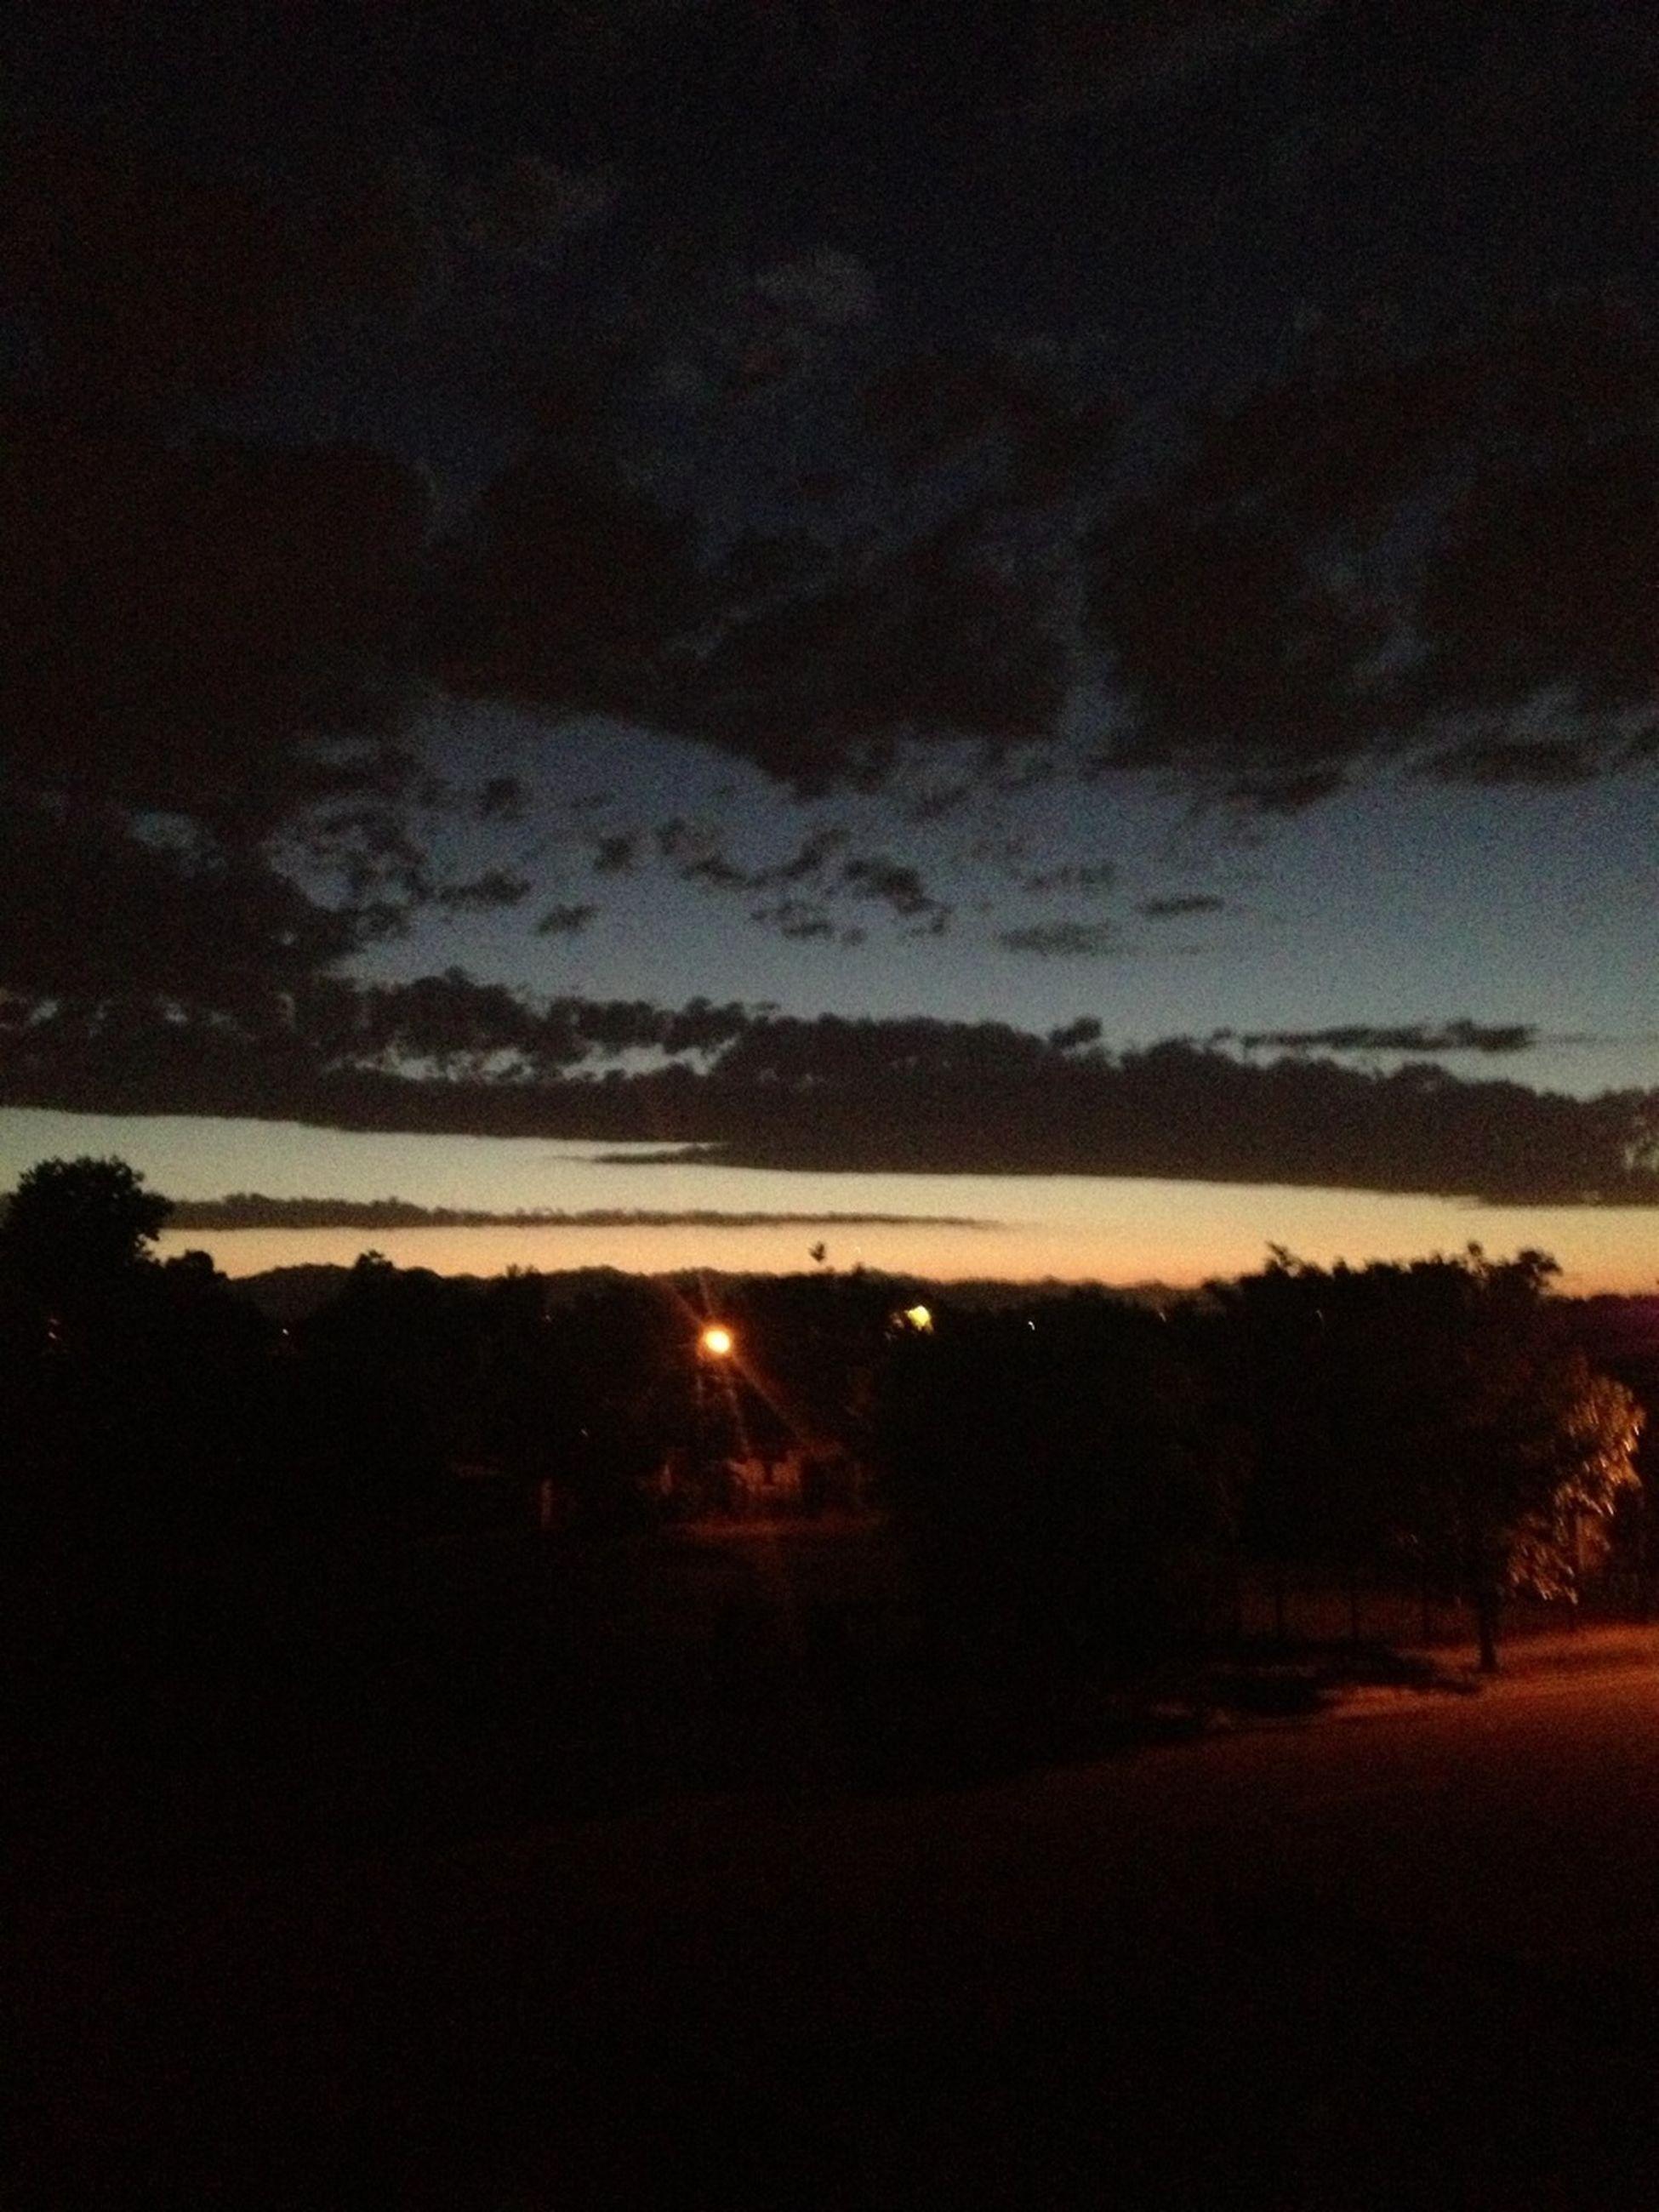 sky, silhouette, sunset, scenics, tranquil scene, tree, tranquility, beauty in nature, landscape, cloud - sky, dark, night, nature, dusk, illuminated, idyllic, outdoors, cloud, no people, non-urban scene